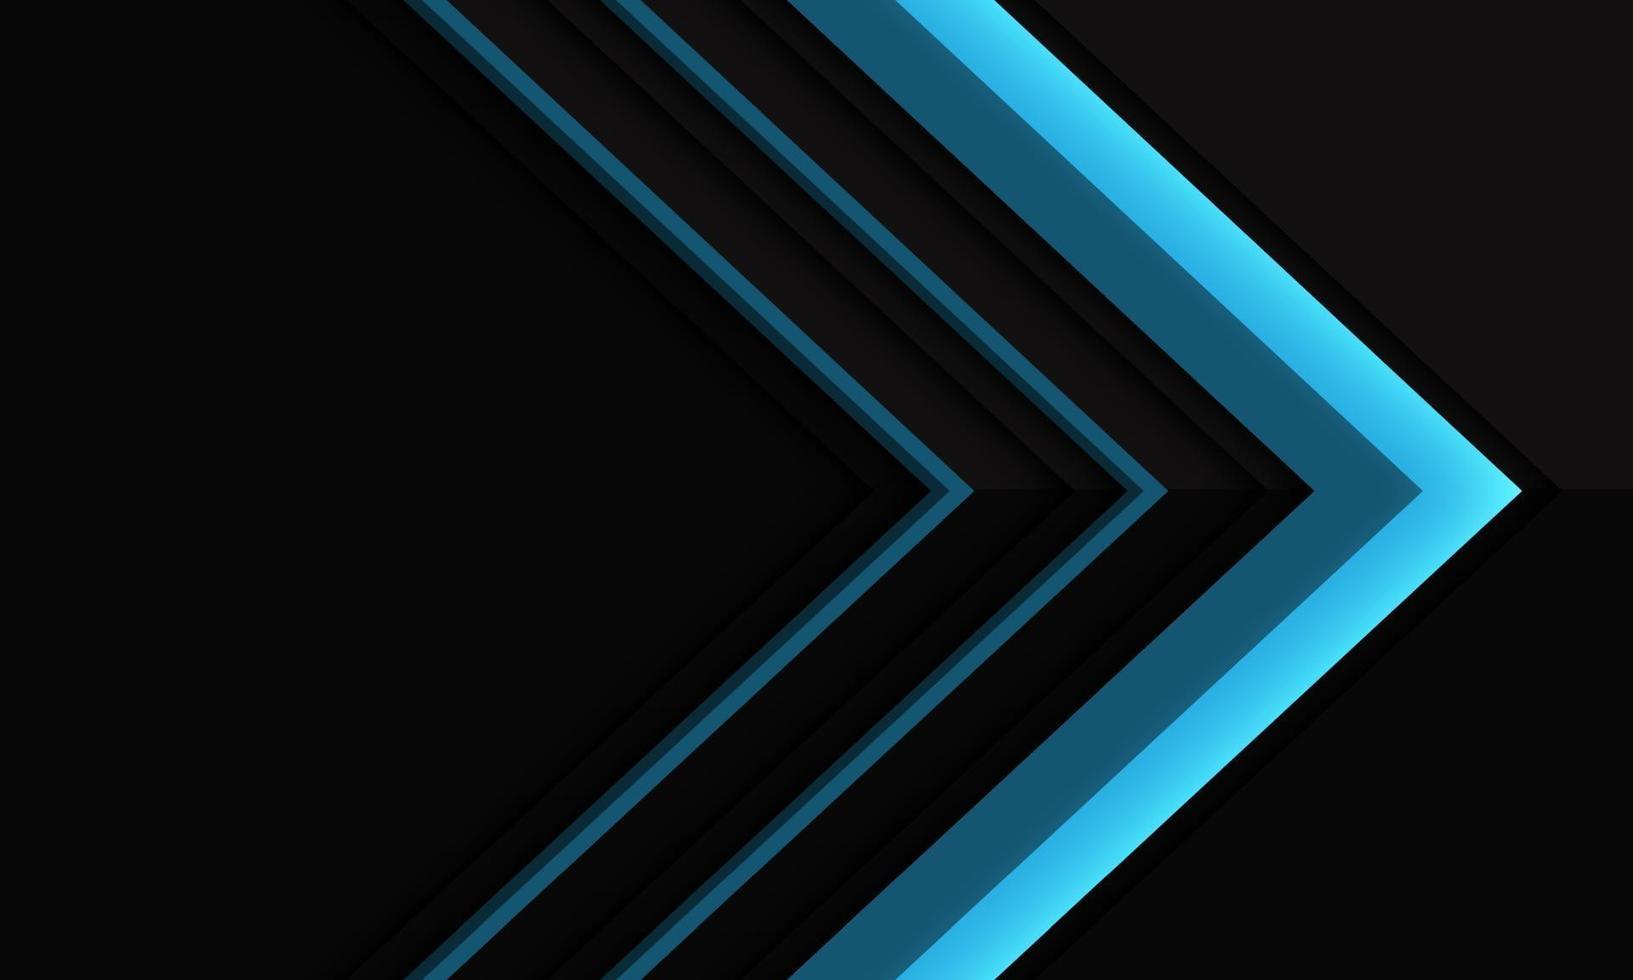 Dirección de flecha azul abstracta en sombra metálica negra con diseño de espacio en blanco ilustración de vector de fondo futurista moderno.